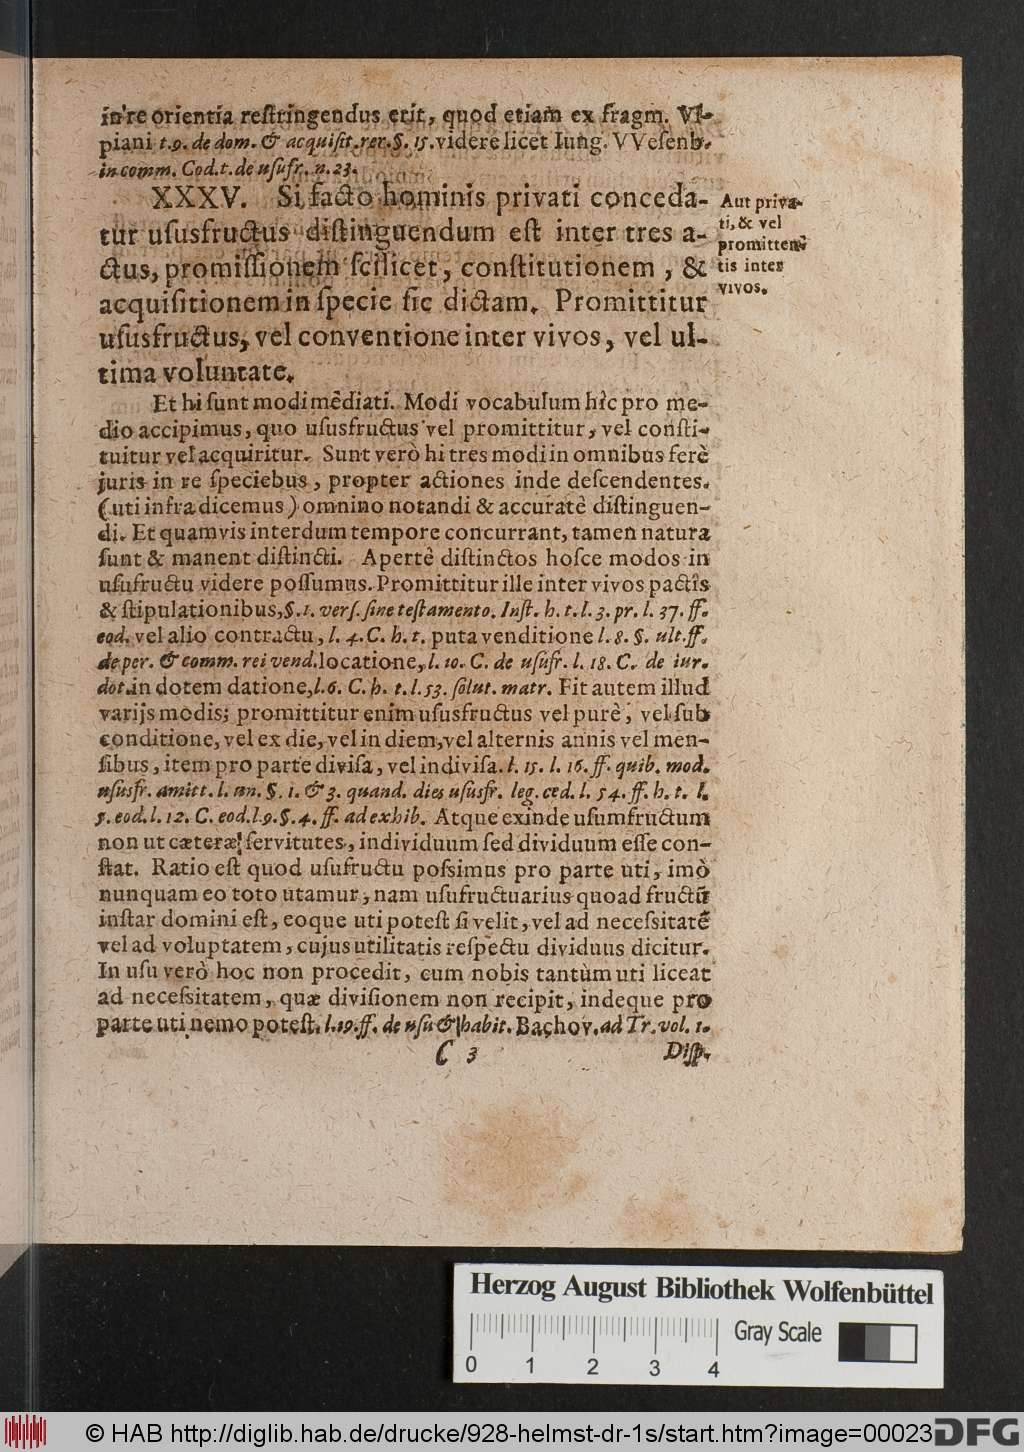 https://diglib.hab.de/drucke/928-helmst-dr-1s/00023.jpg